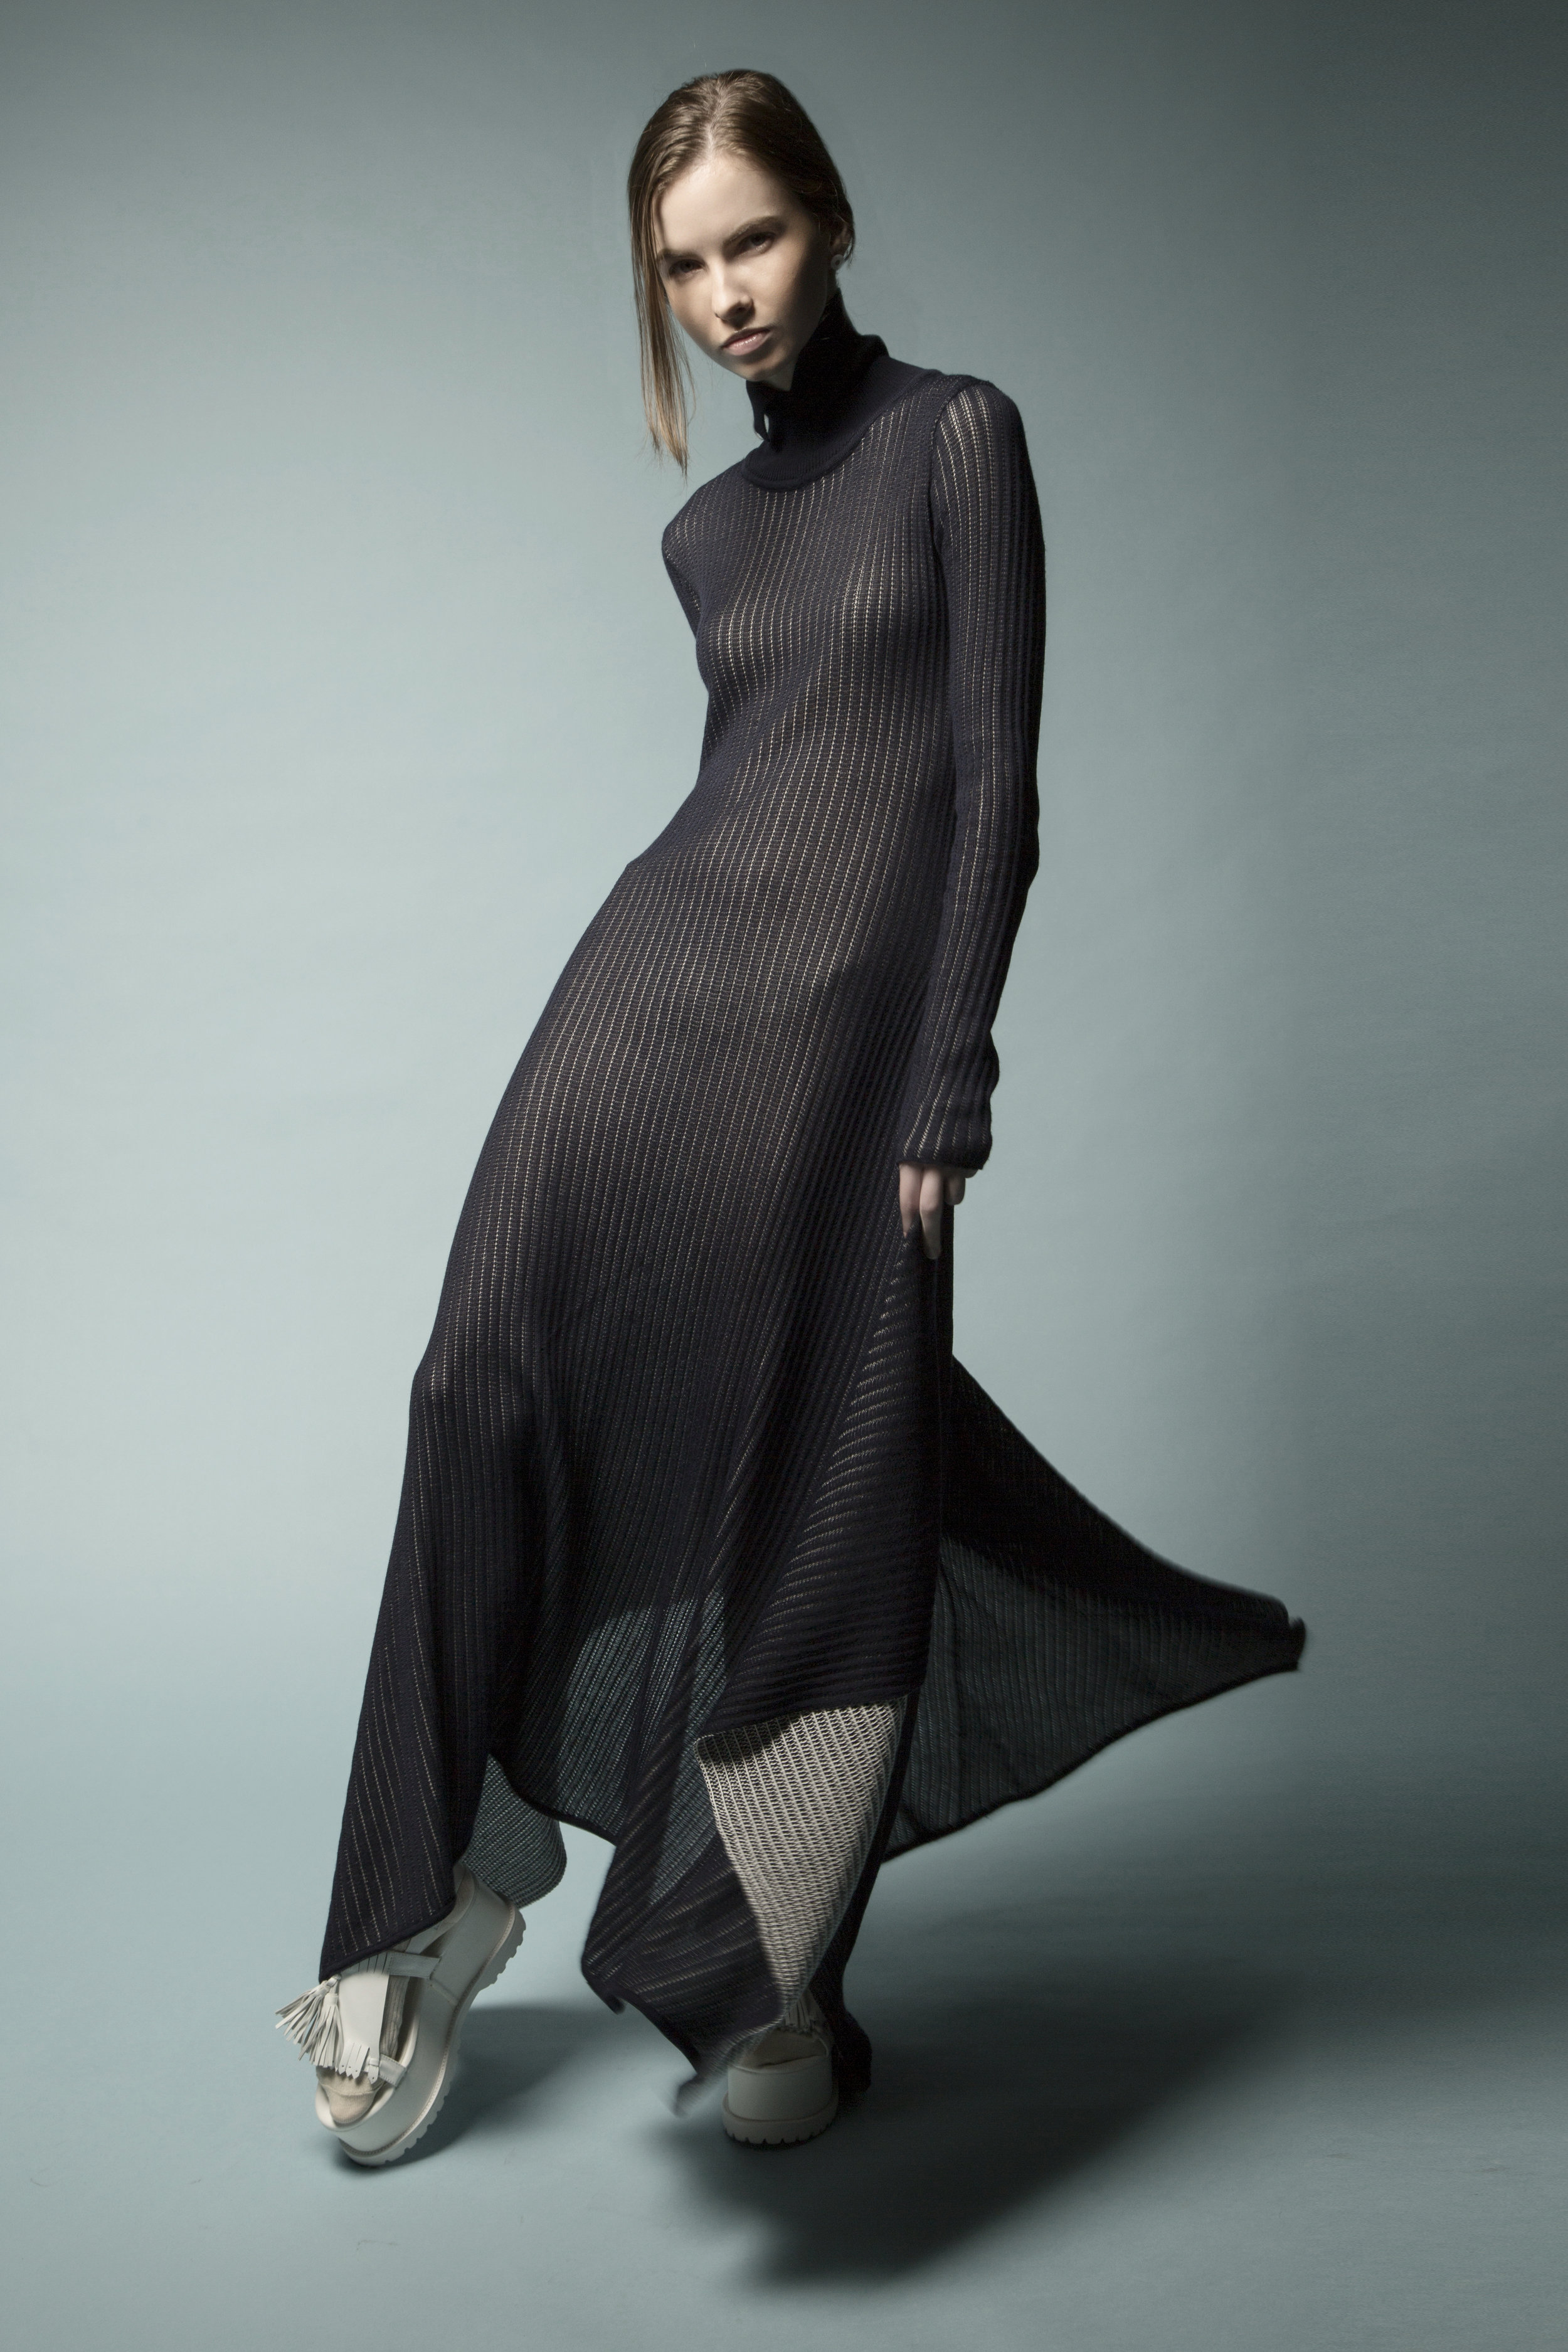 bom-kim-knitwear-bob-cut-6